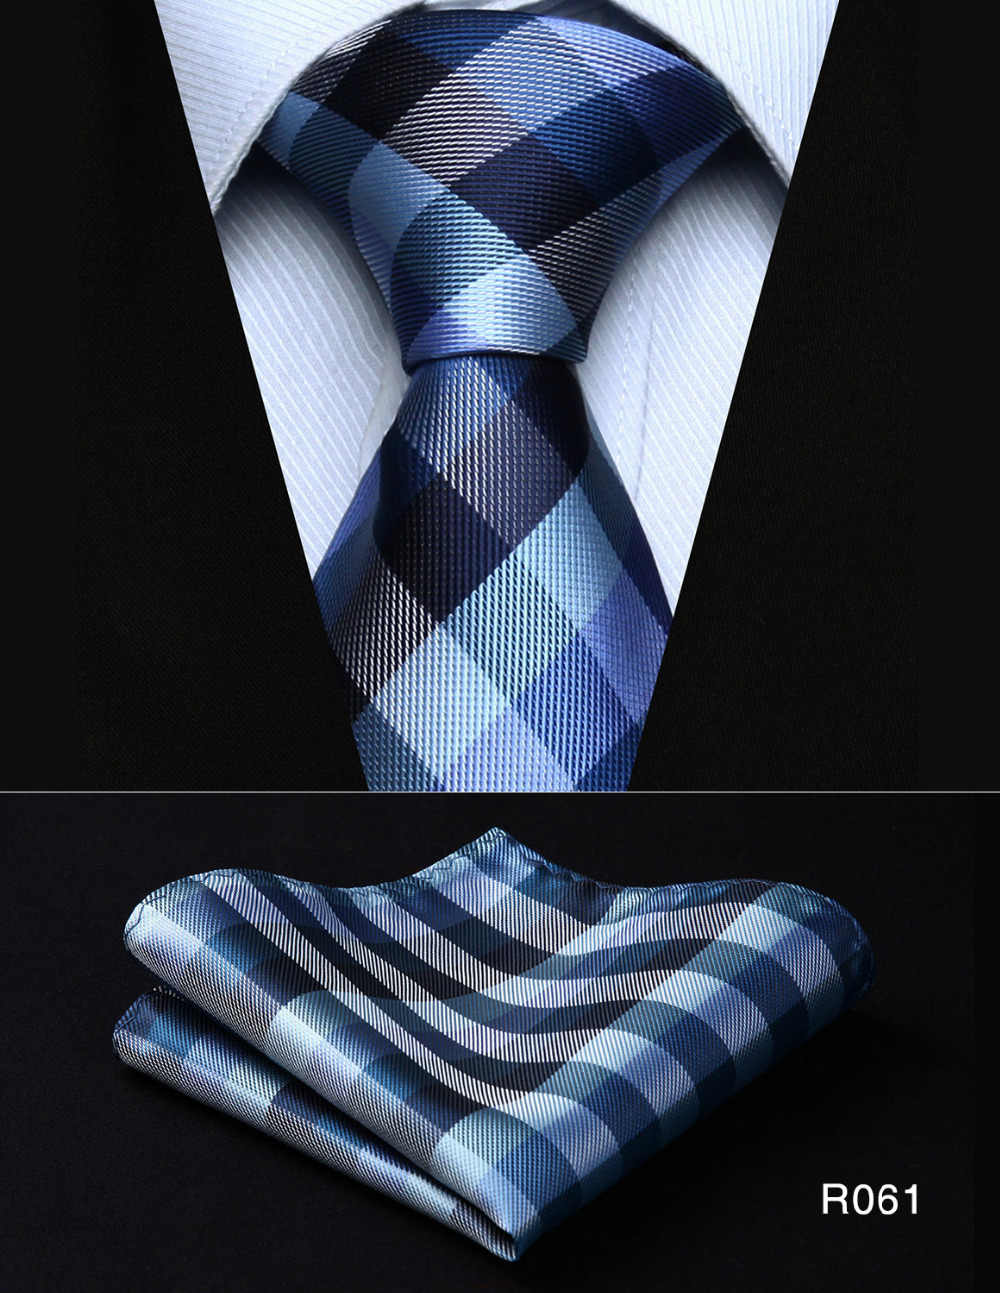 bc8fc1555f1e6 ... Men's Tie Pocket Square Classic Party Wedding Fashion Paisley 3.4